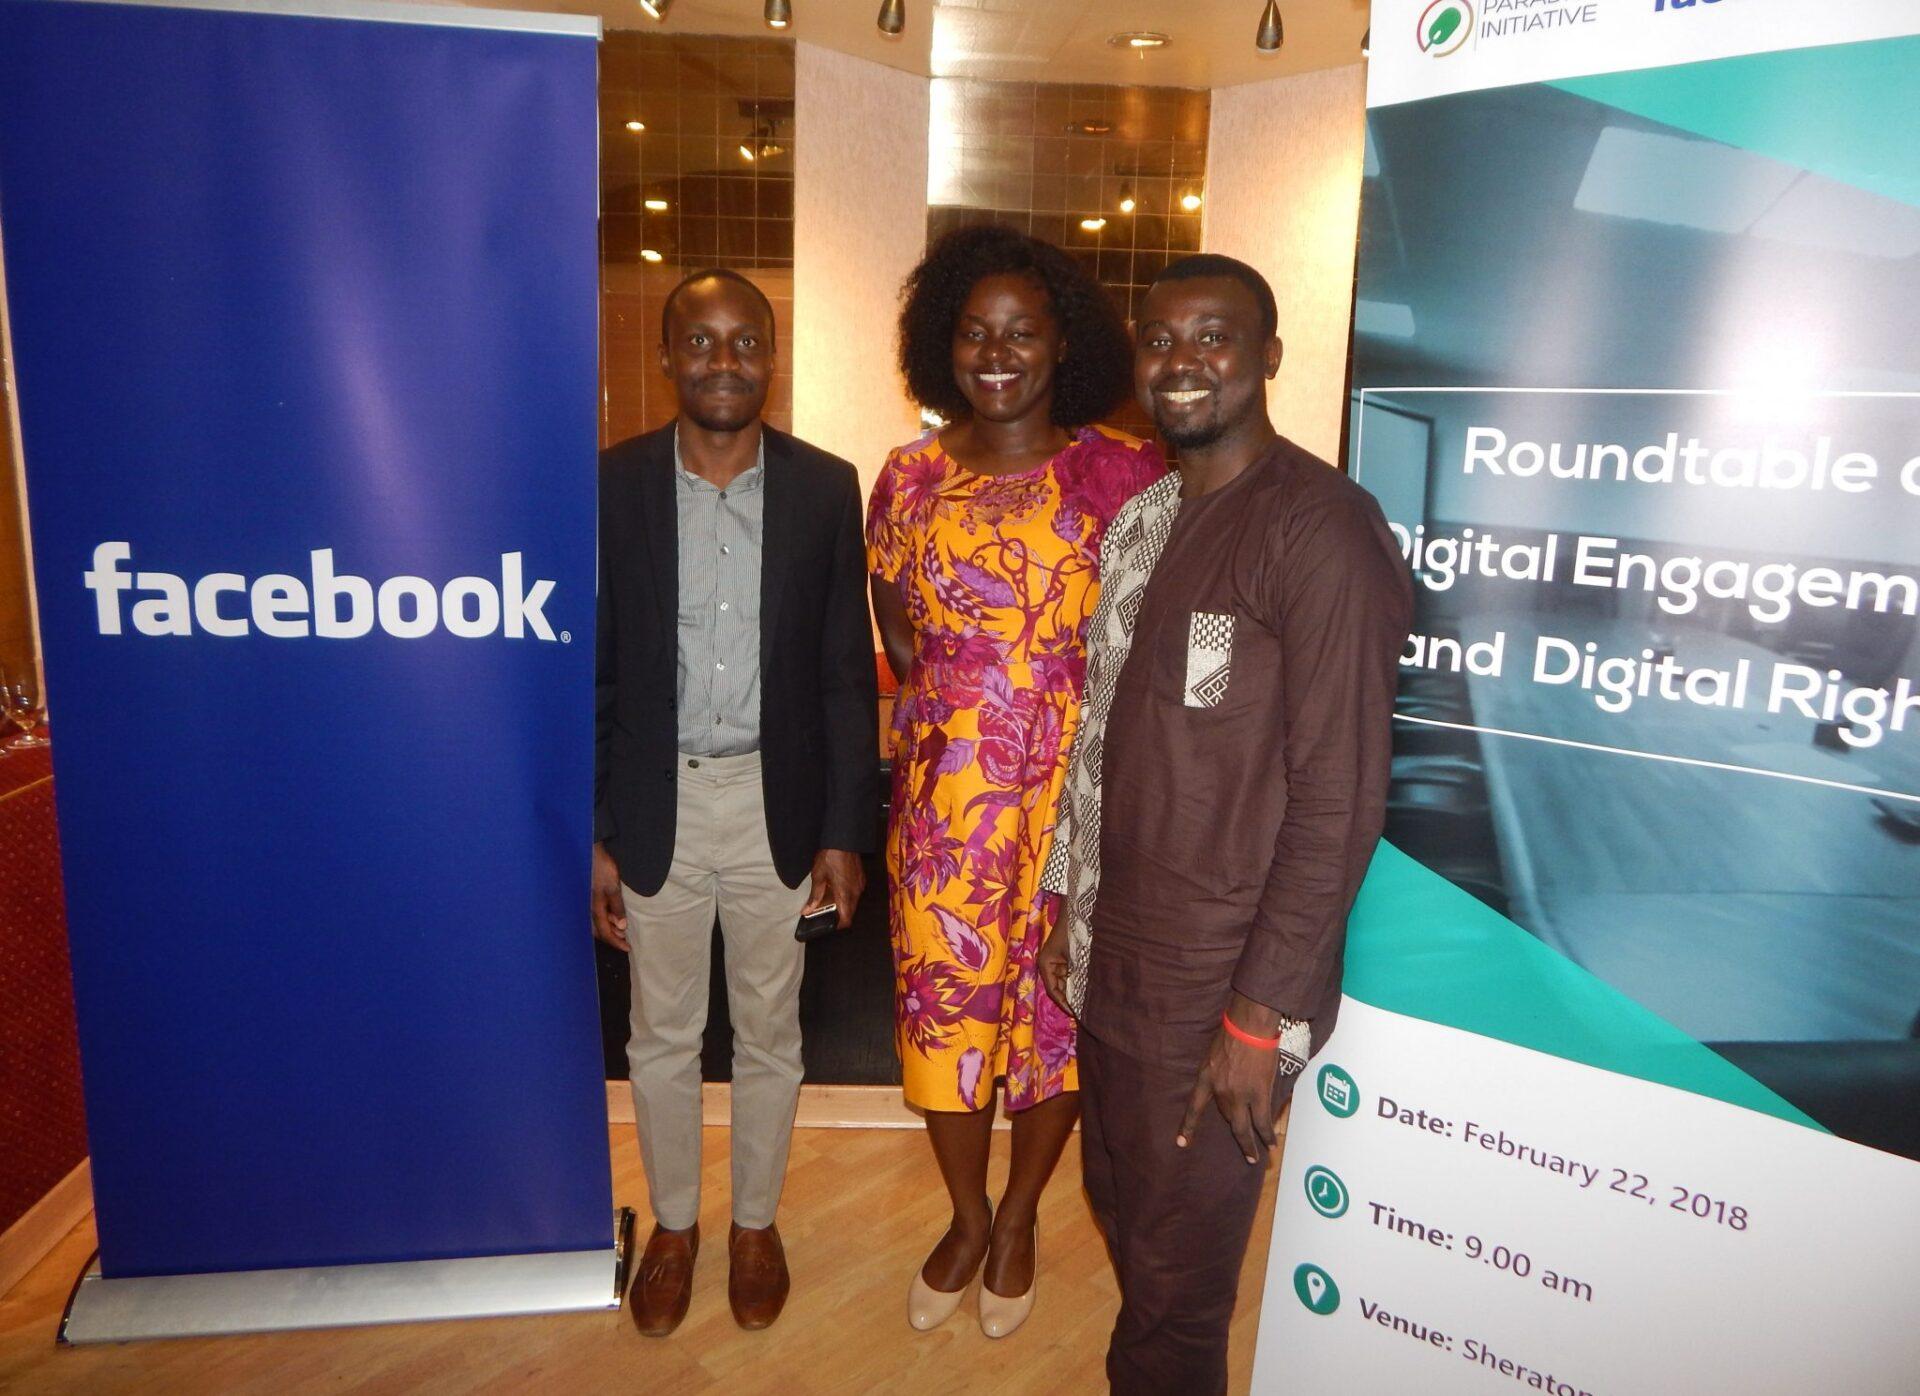 Nigeria | PIN, Presidency, Facebook forge digital engagement alliance